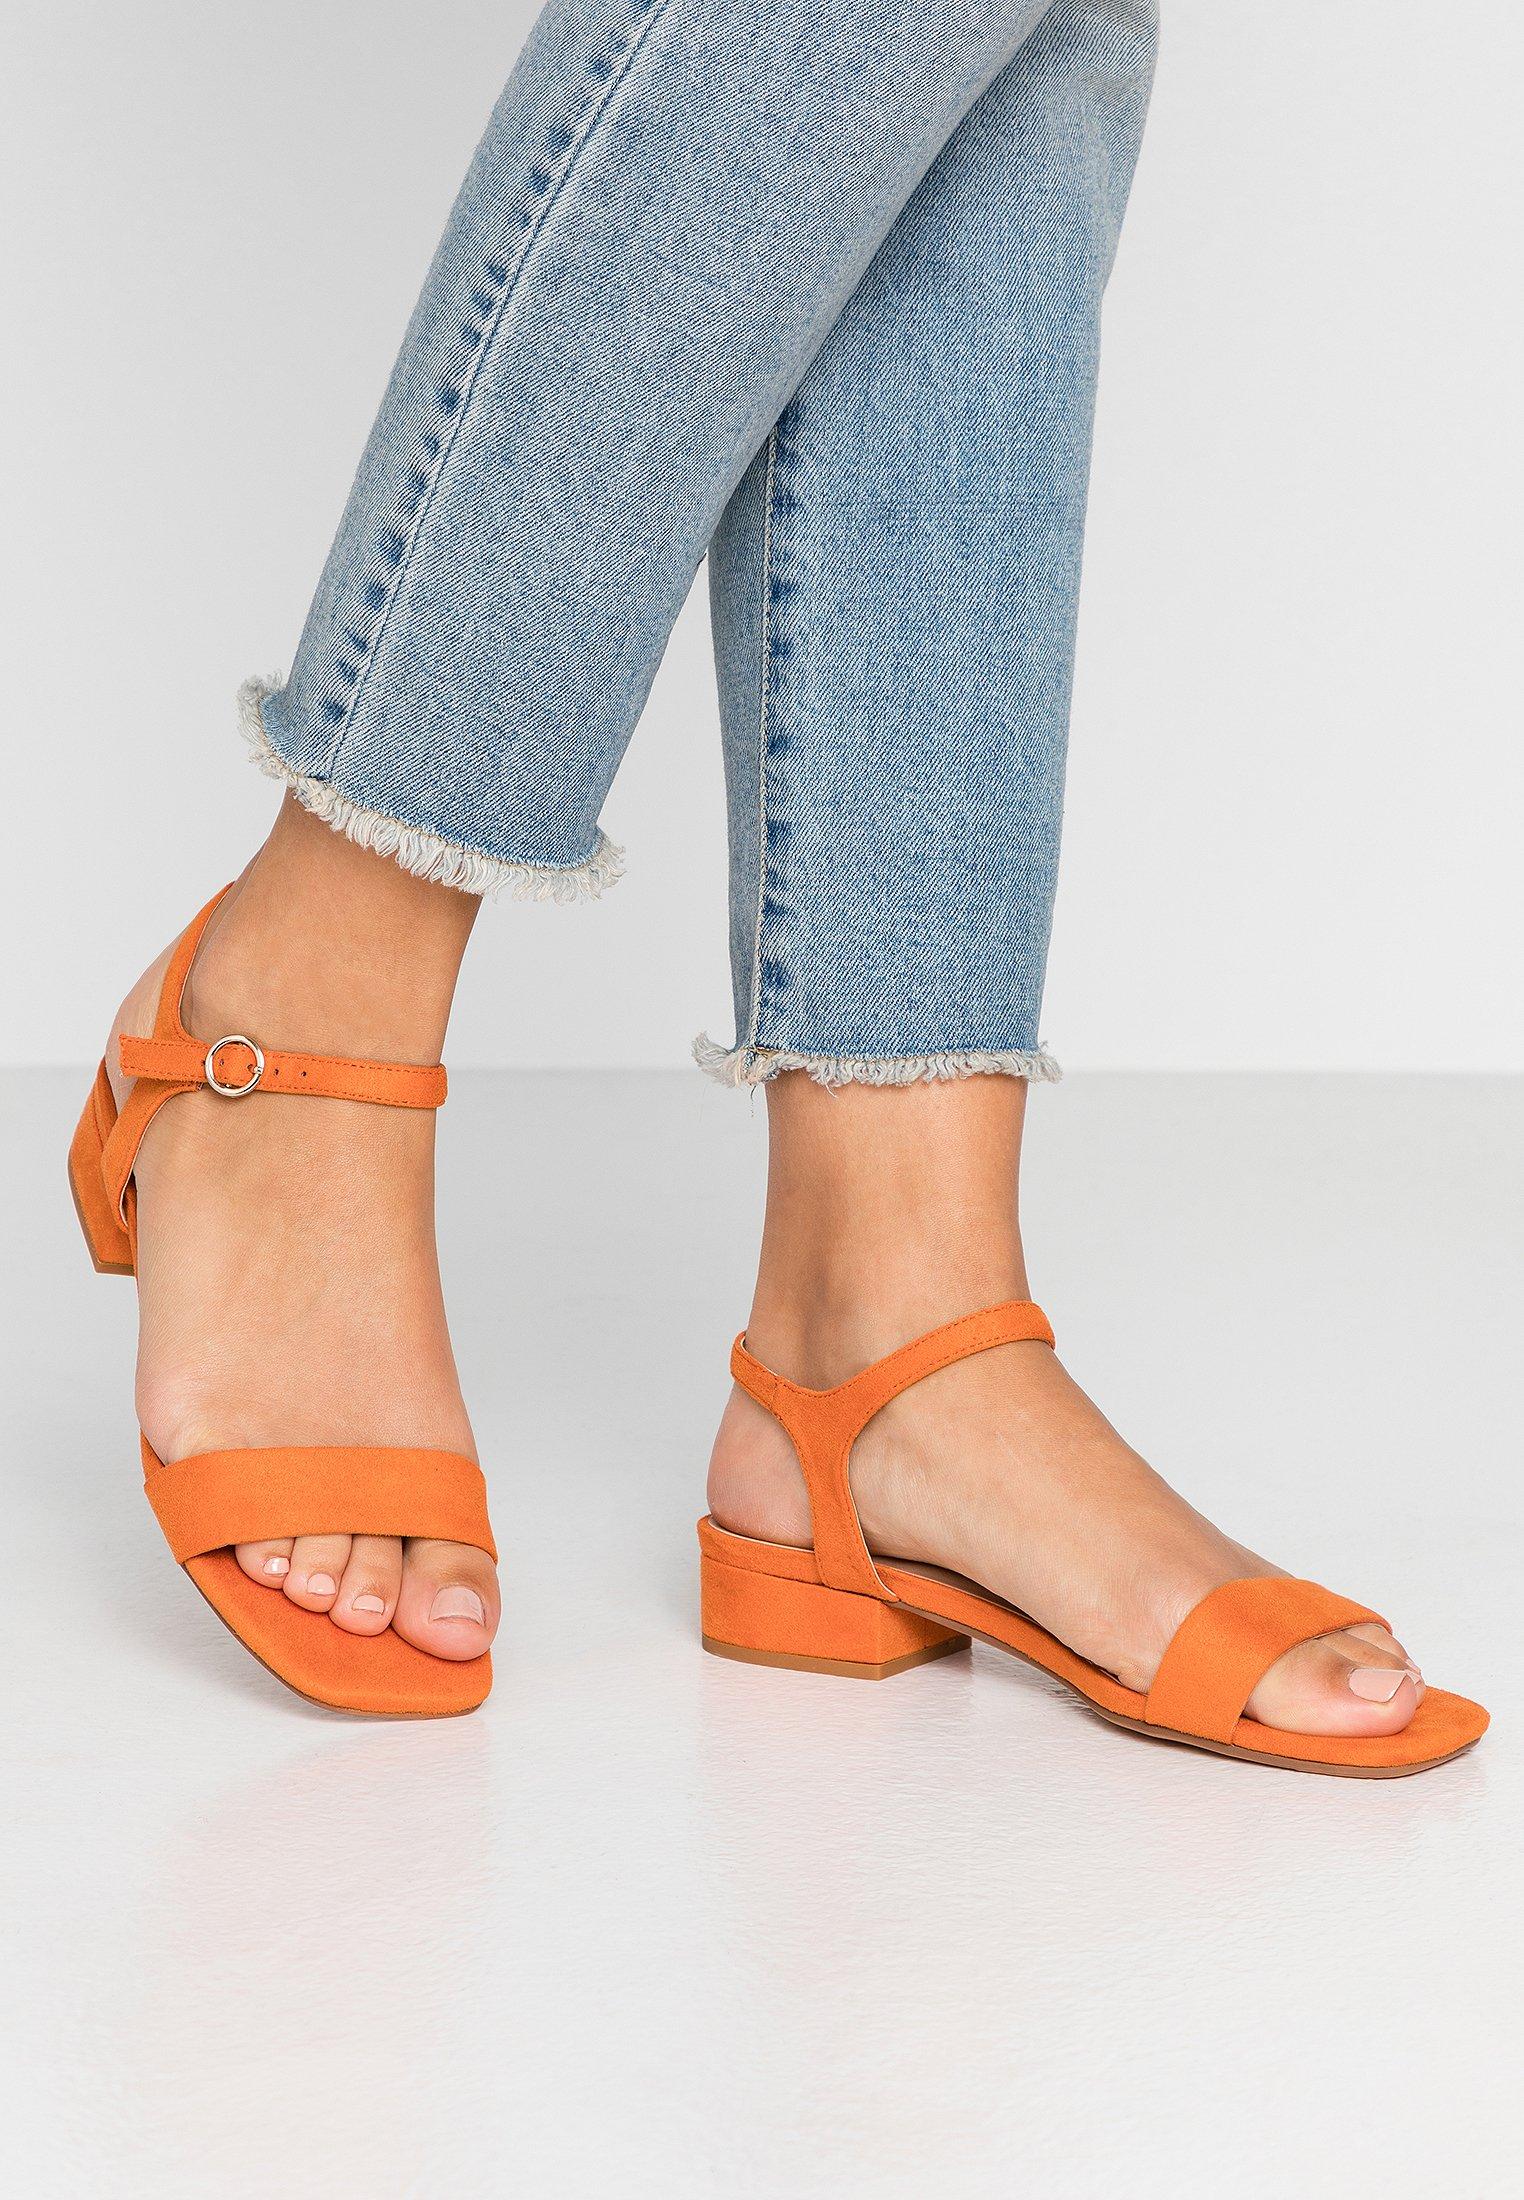 Sandali orange